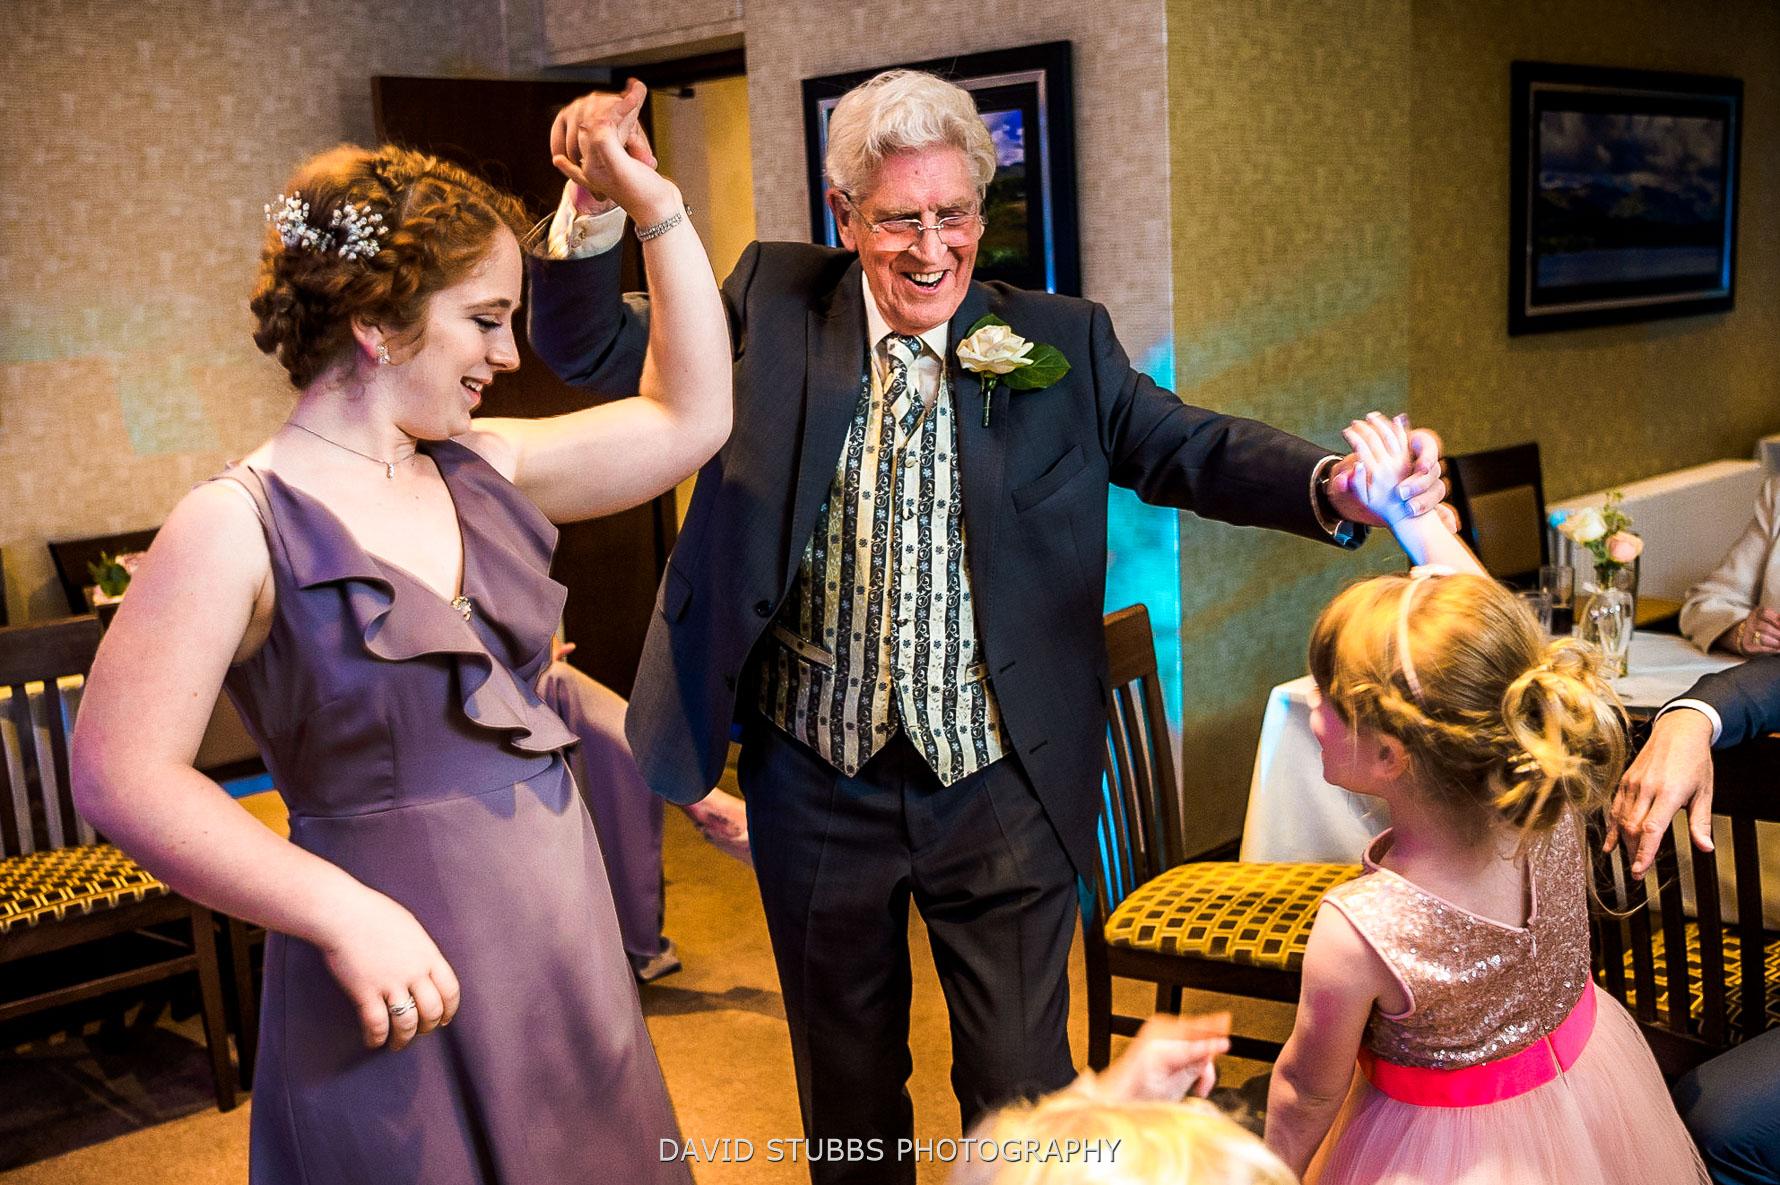 dancing with grandad